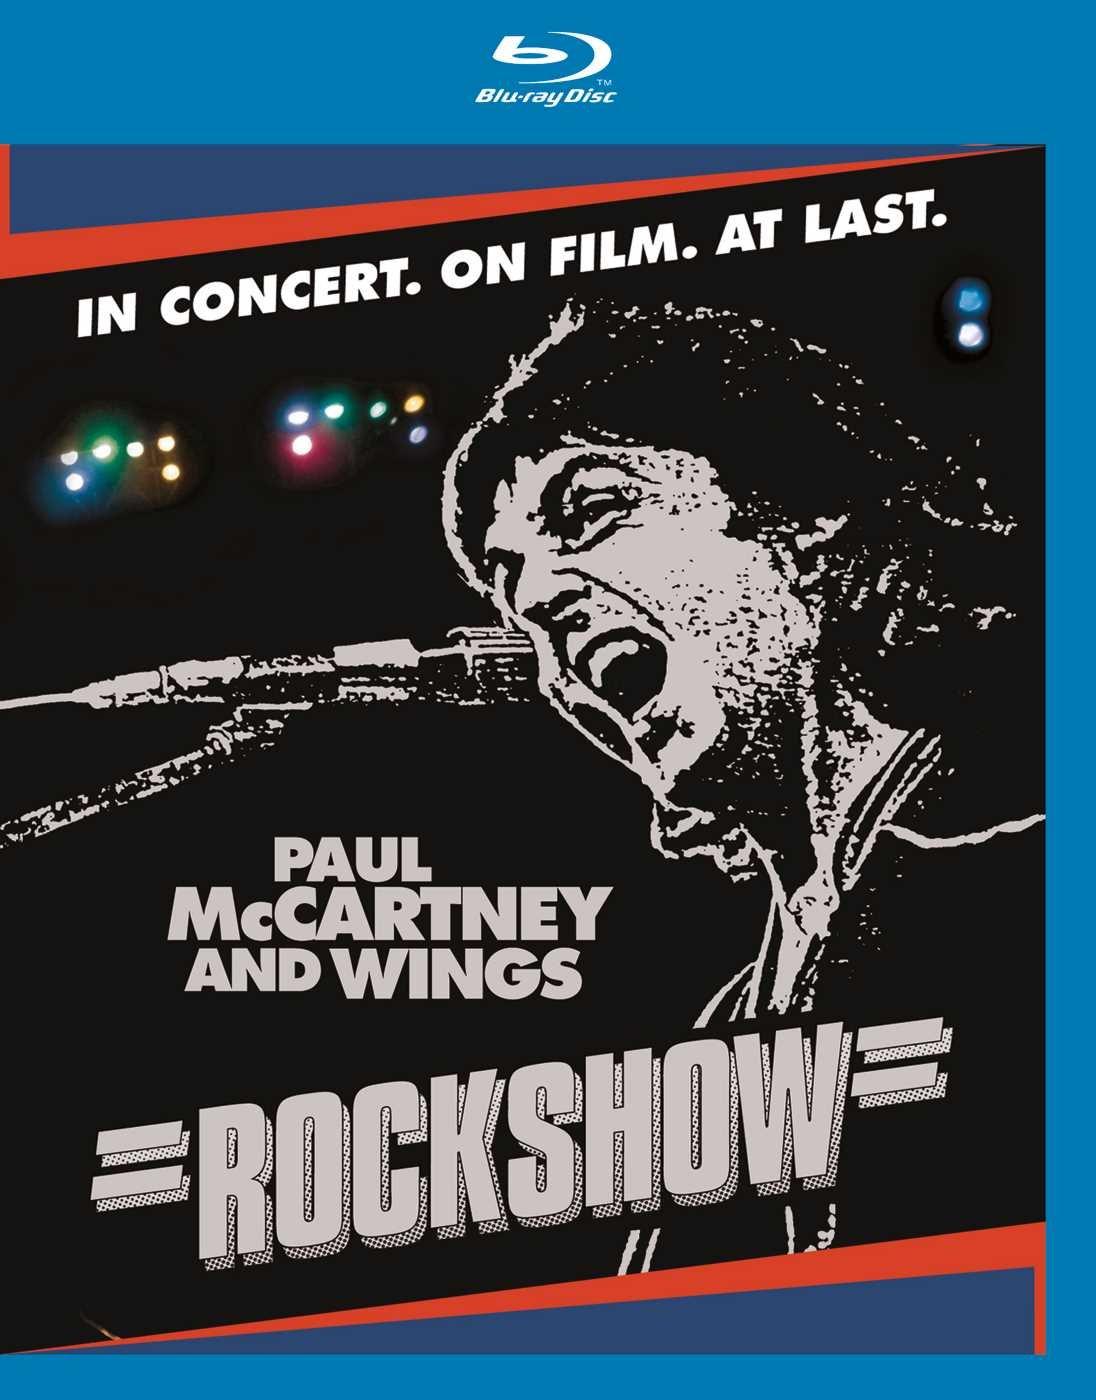 цена на Paul McCartney. Rockshow (DVD)